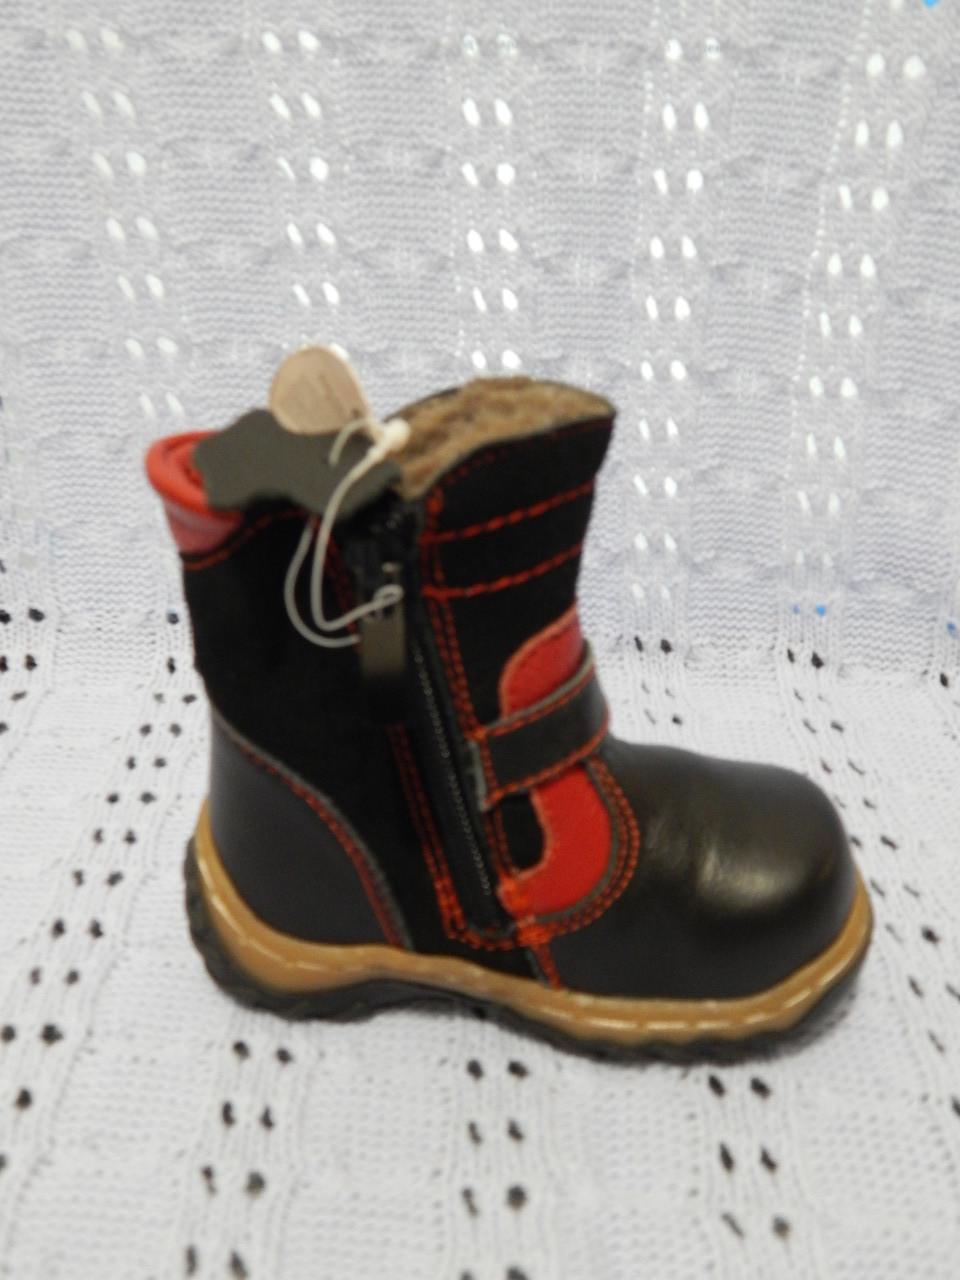 Зимние ботиночки детские ТМ Шалунишка